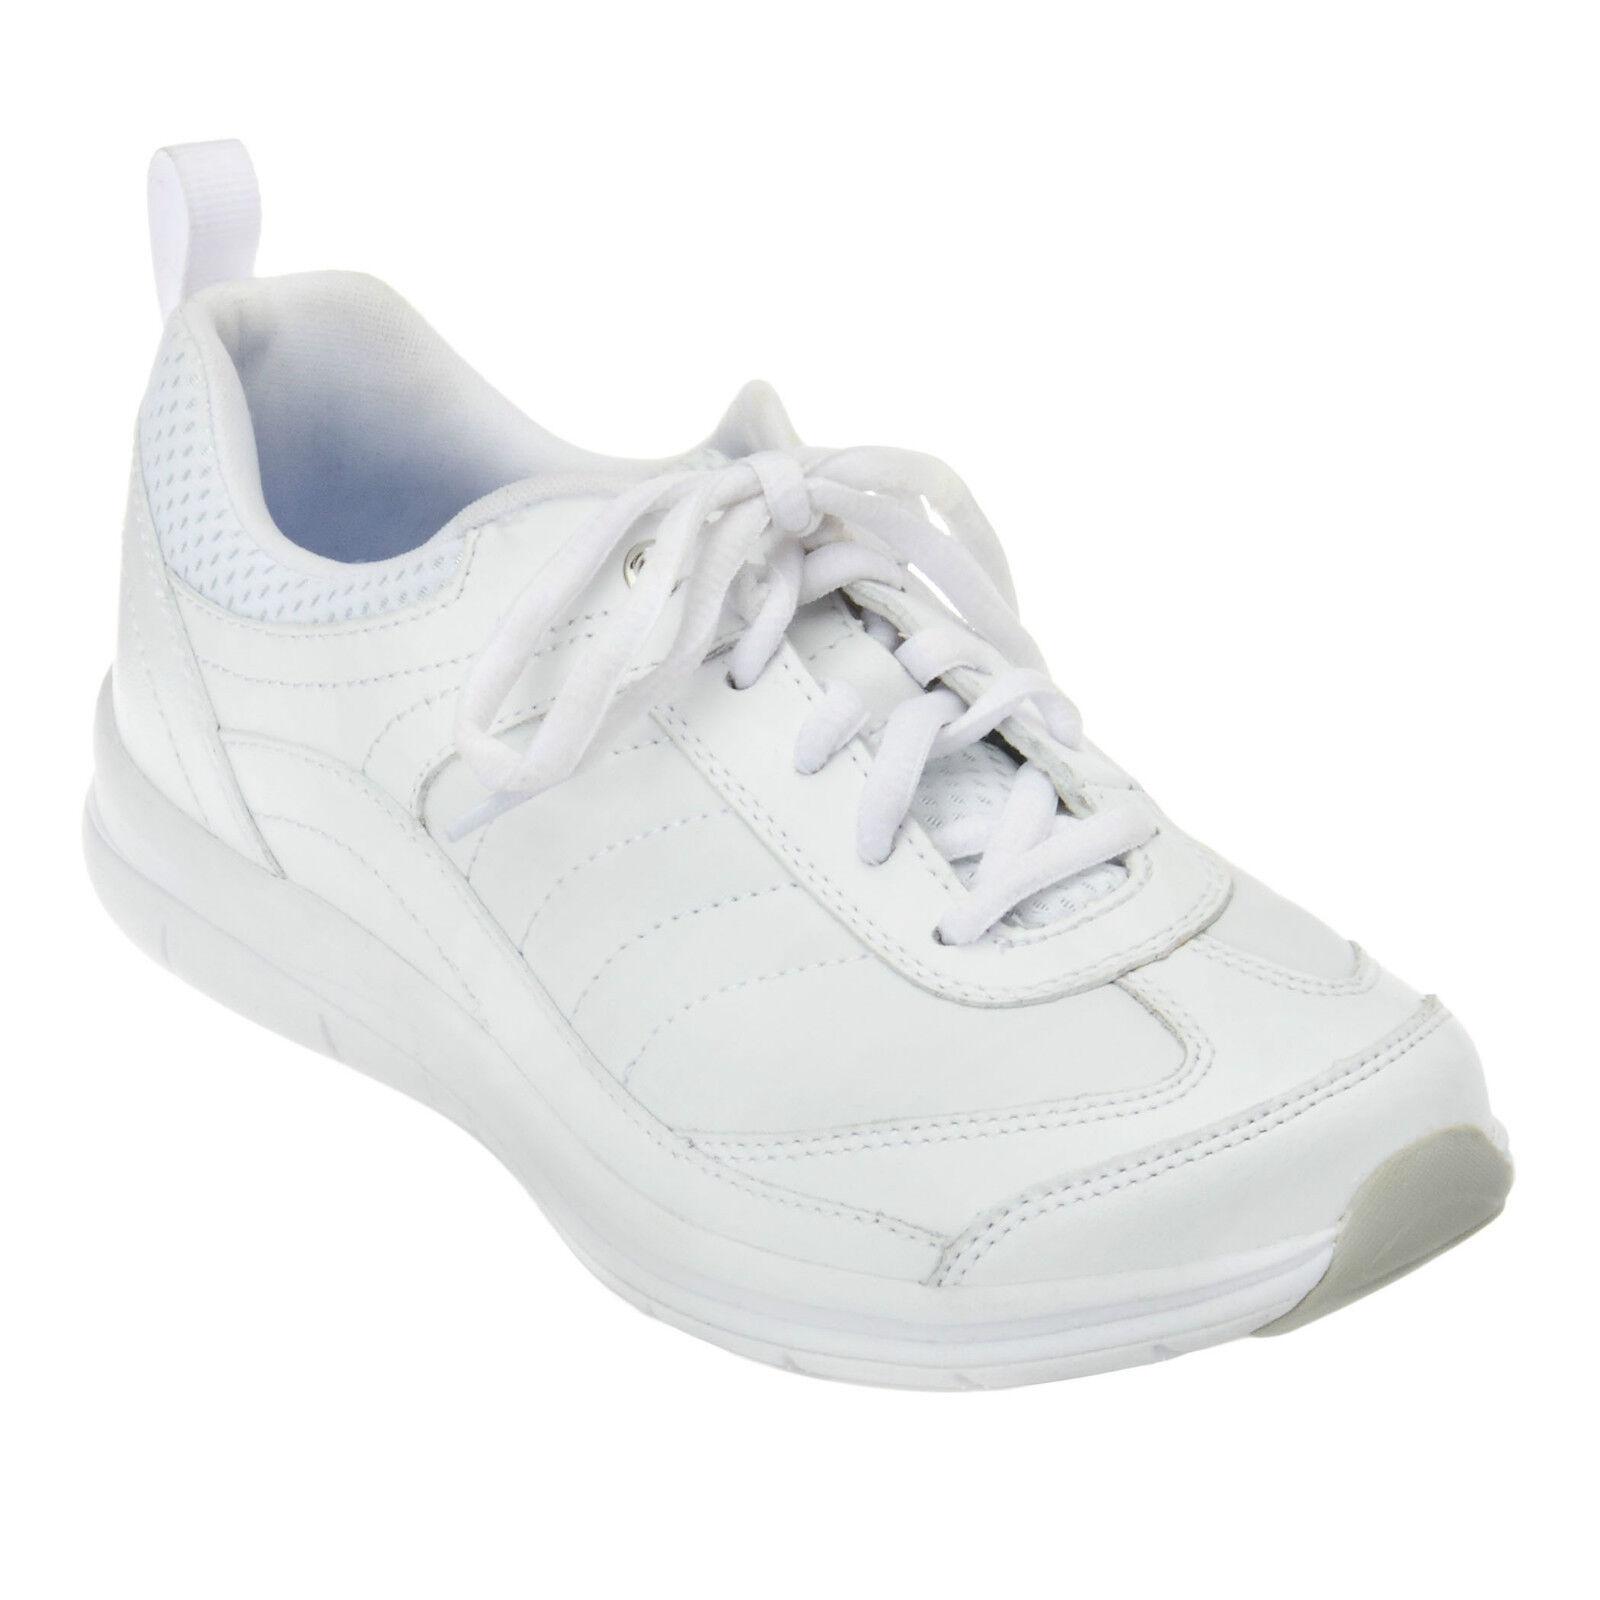 Easy Spirit Southcoast athletic shoe GEL WEISS Leder sz 6 WIDE NEU